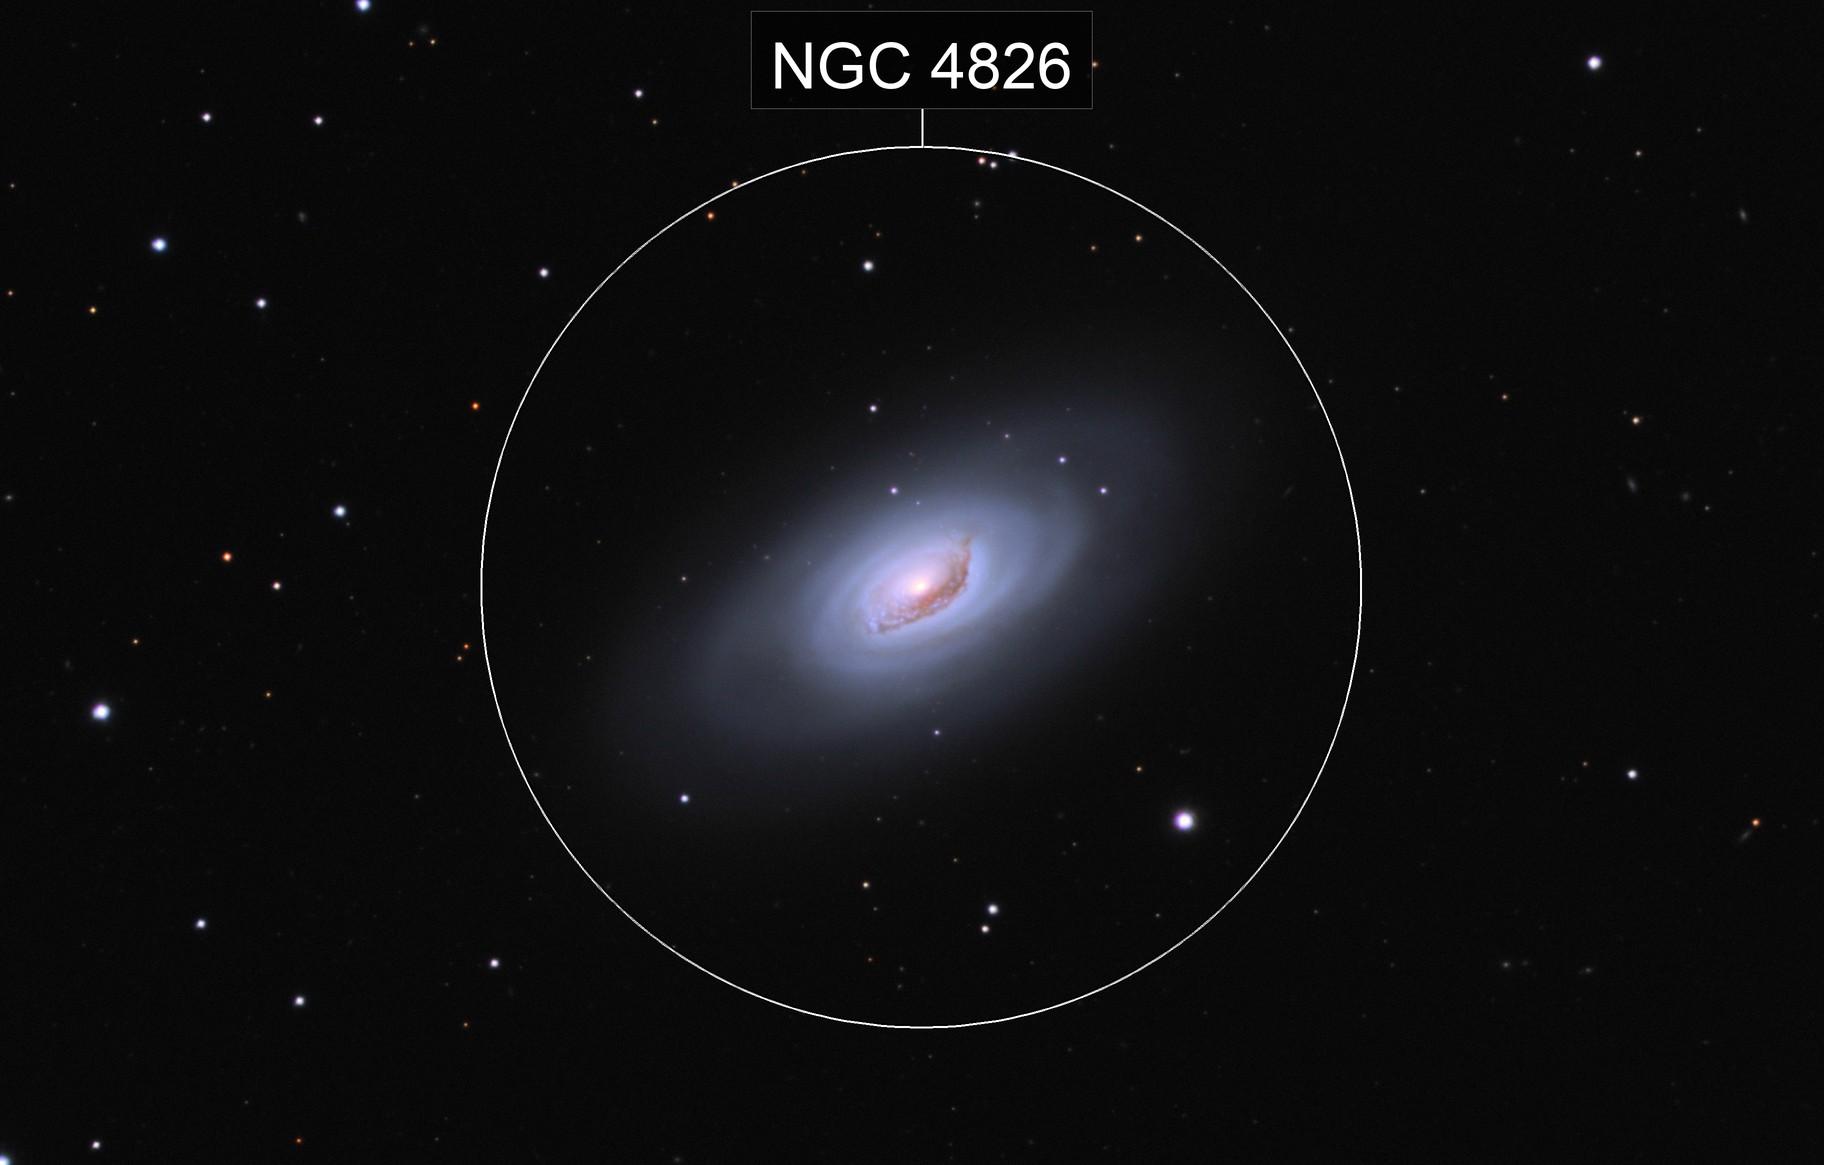 Messier 64 - The Black Eye Galaxy